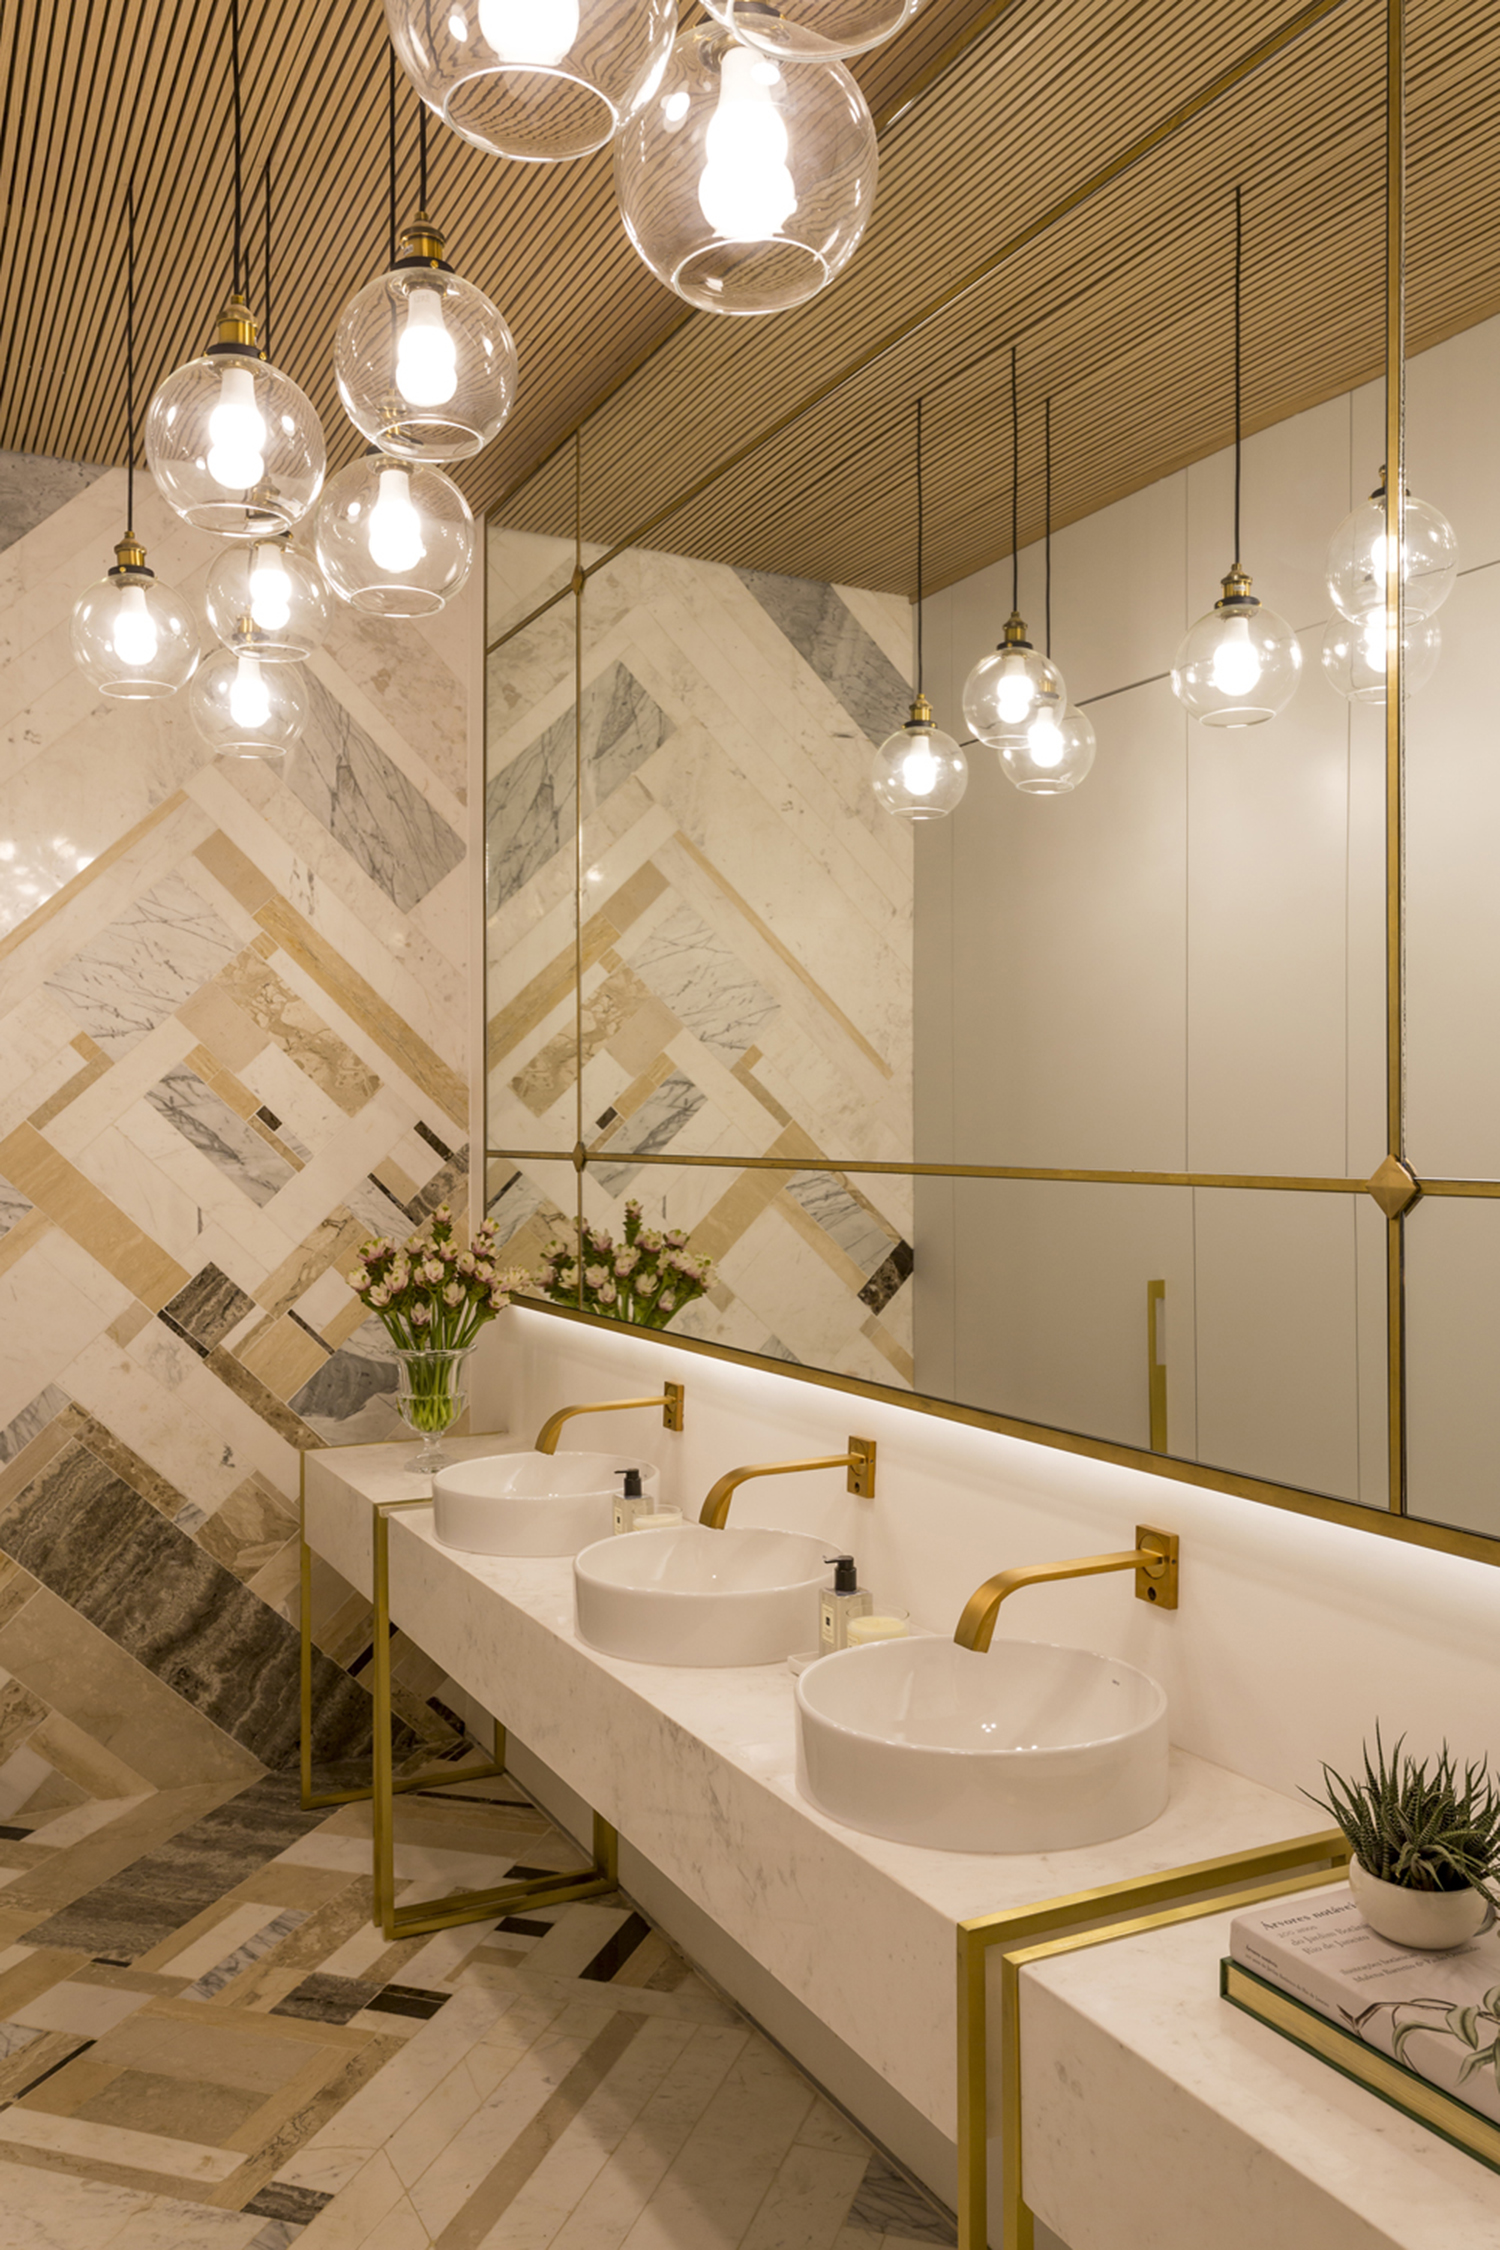 01-banheiro-feminino-casacorsp2016